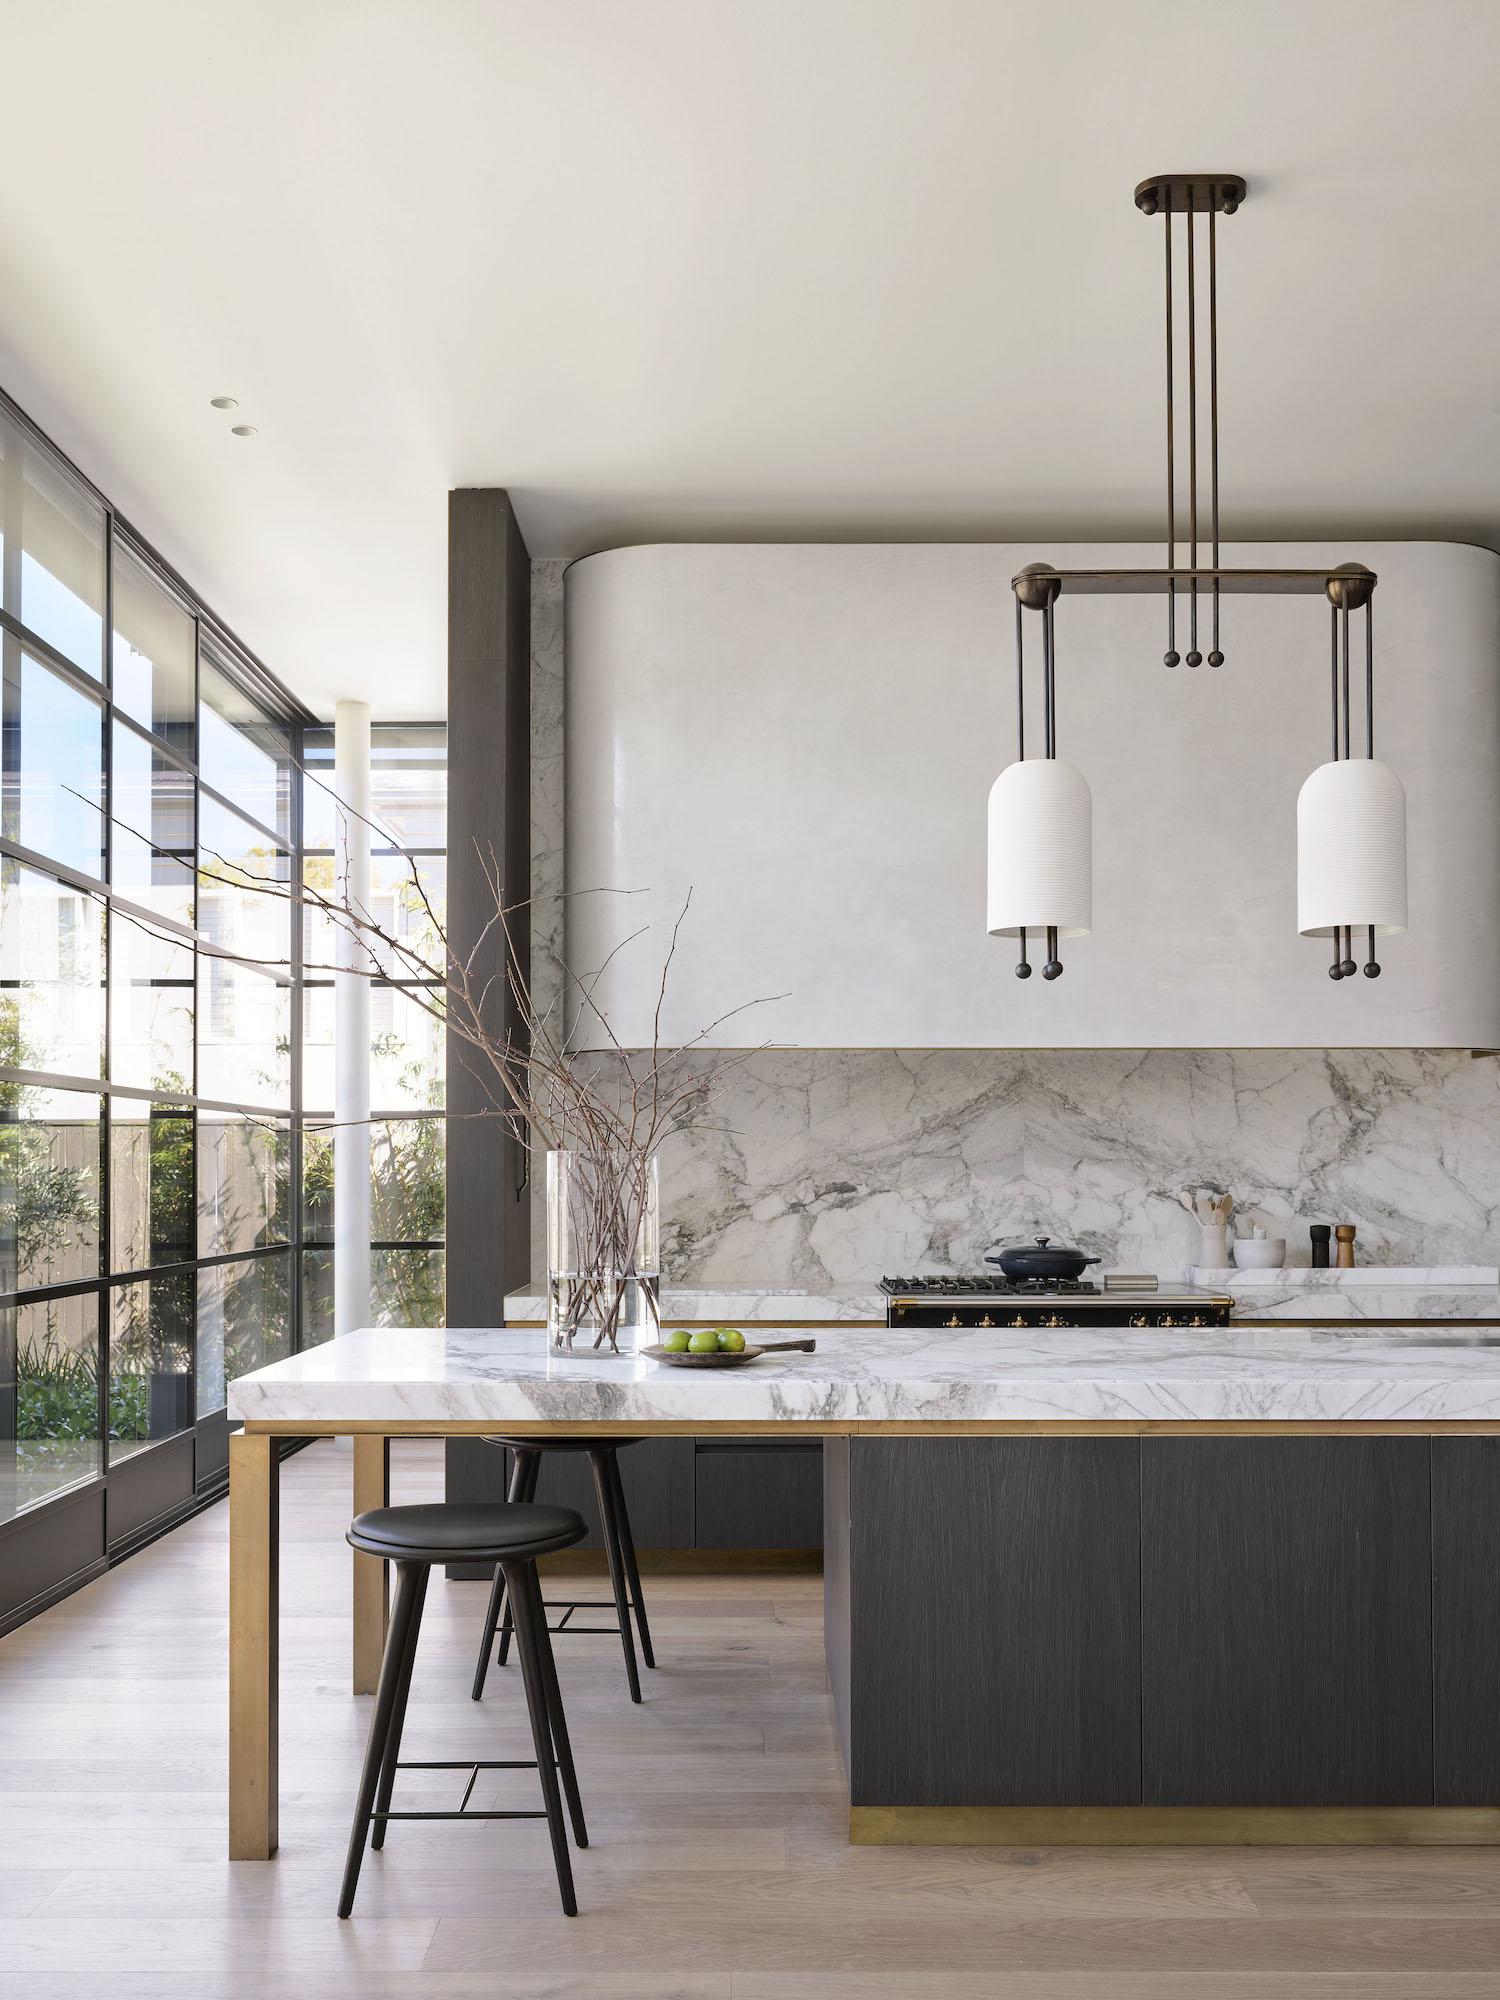 est living bellevue hill house pohio adams architects 10